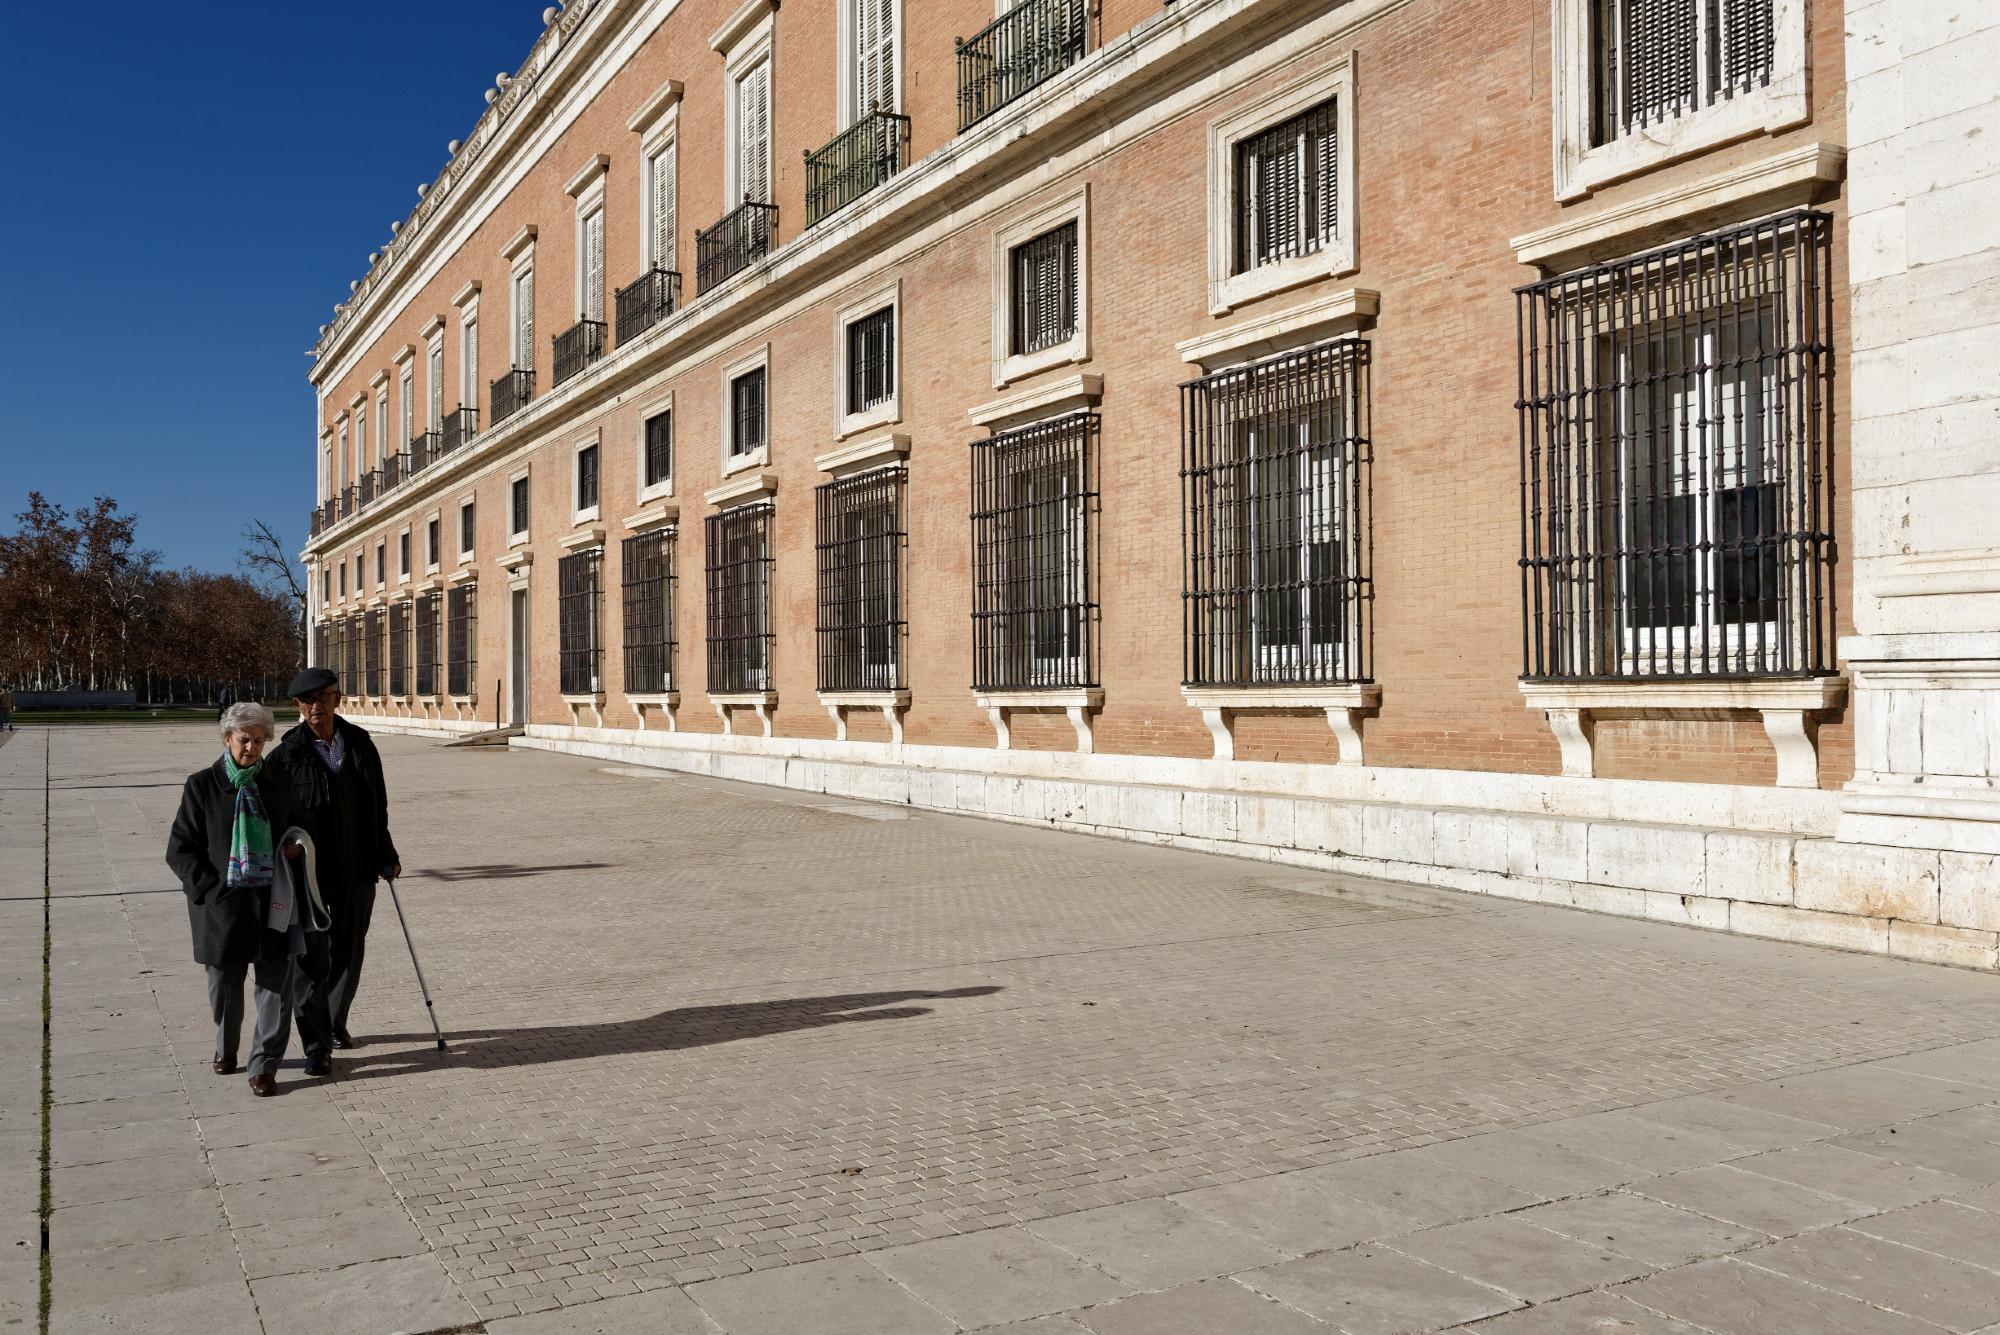 171221-Aranjuez (Castille) (26)